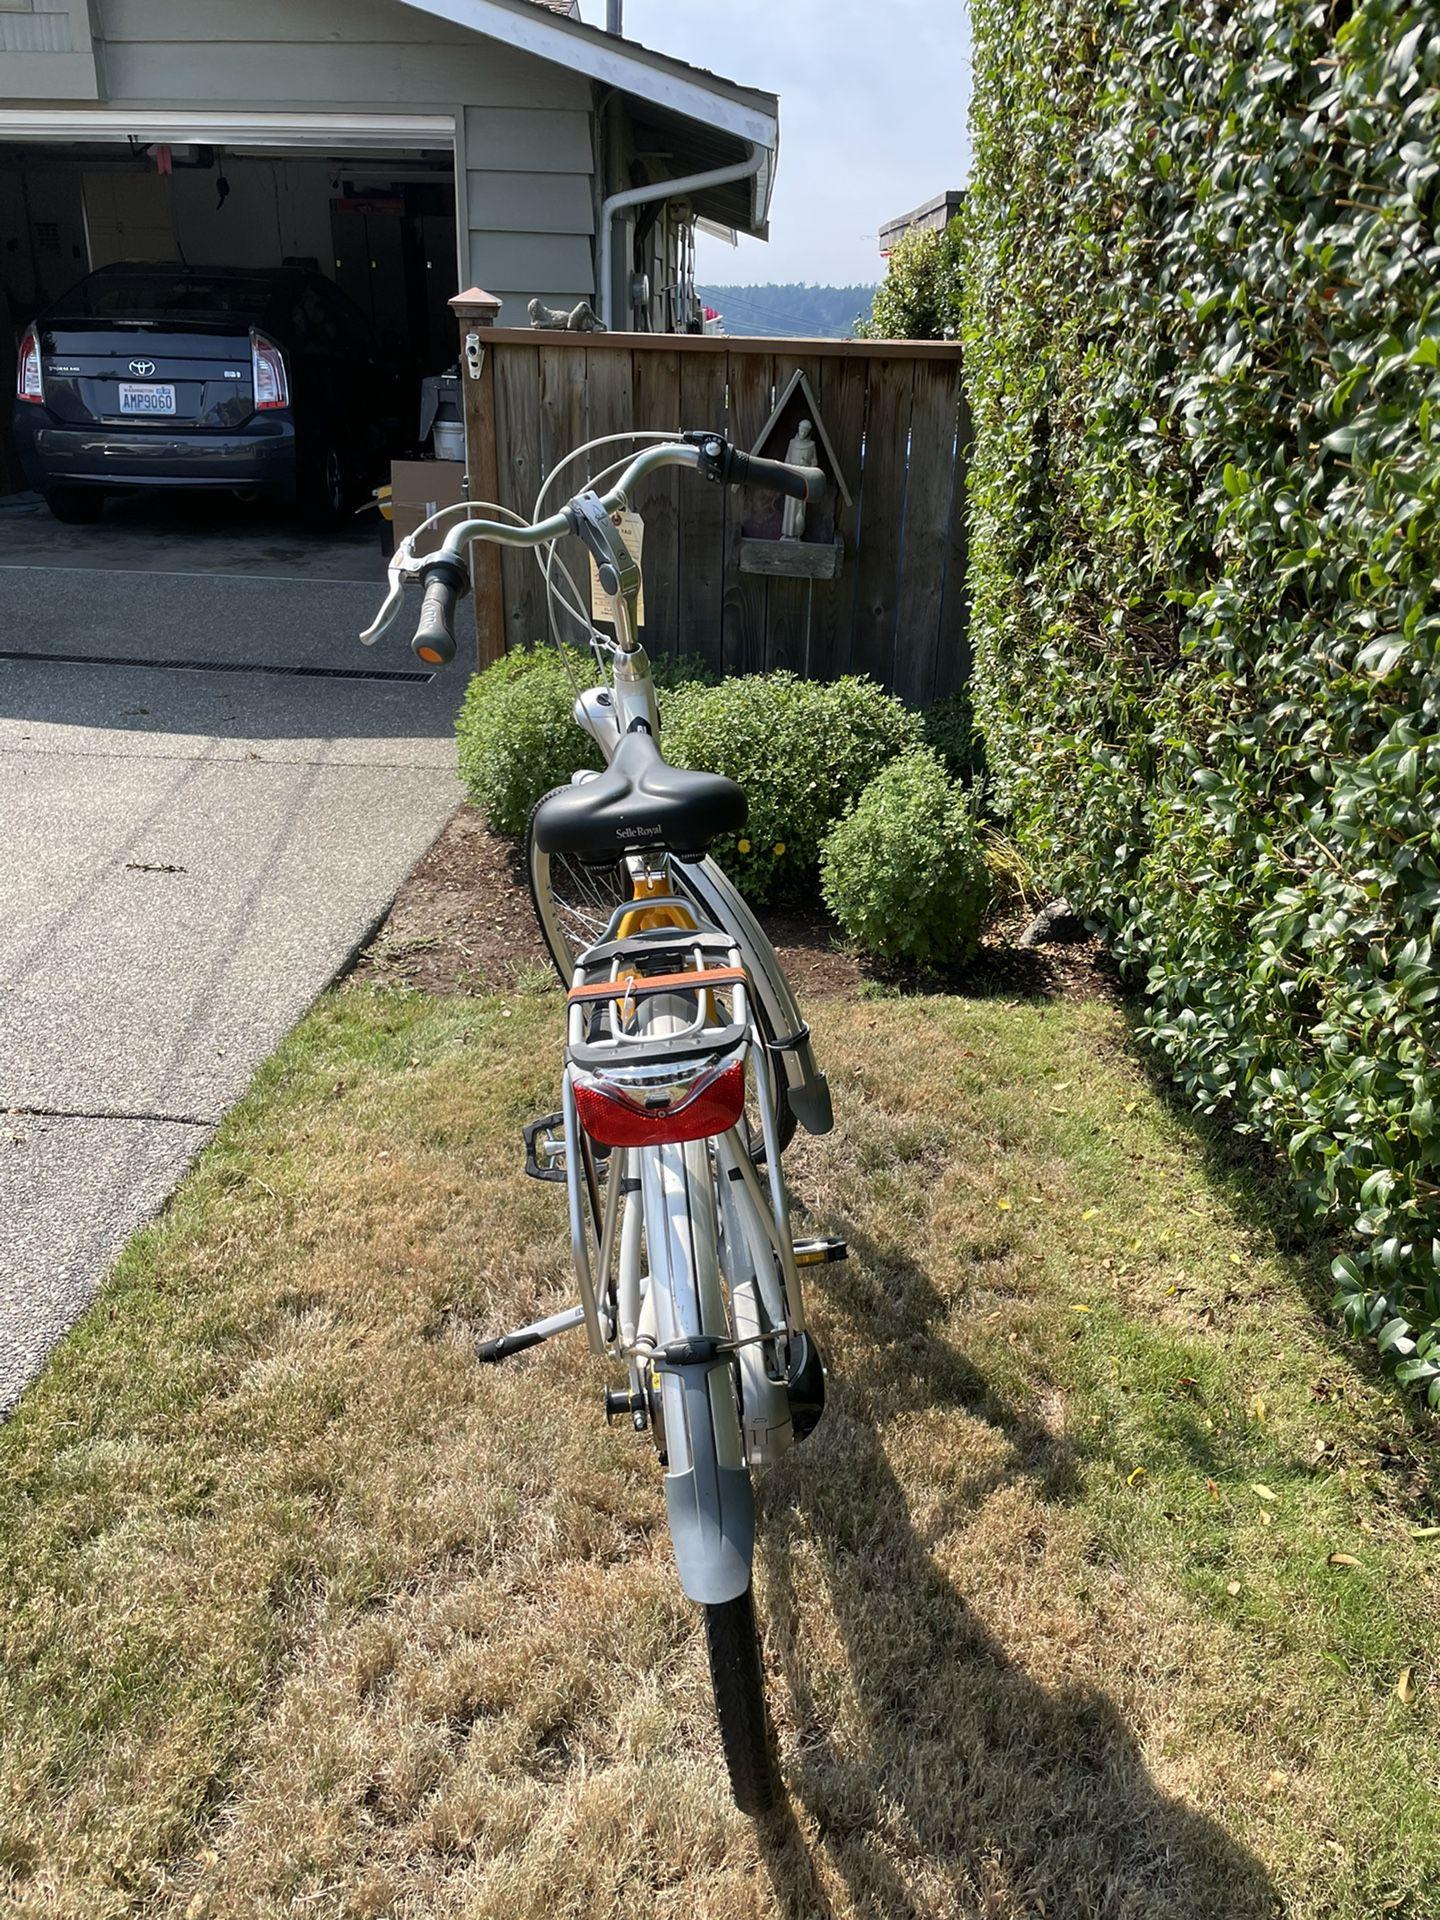 Gazelle Dutch Bike -brand new